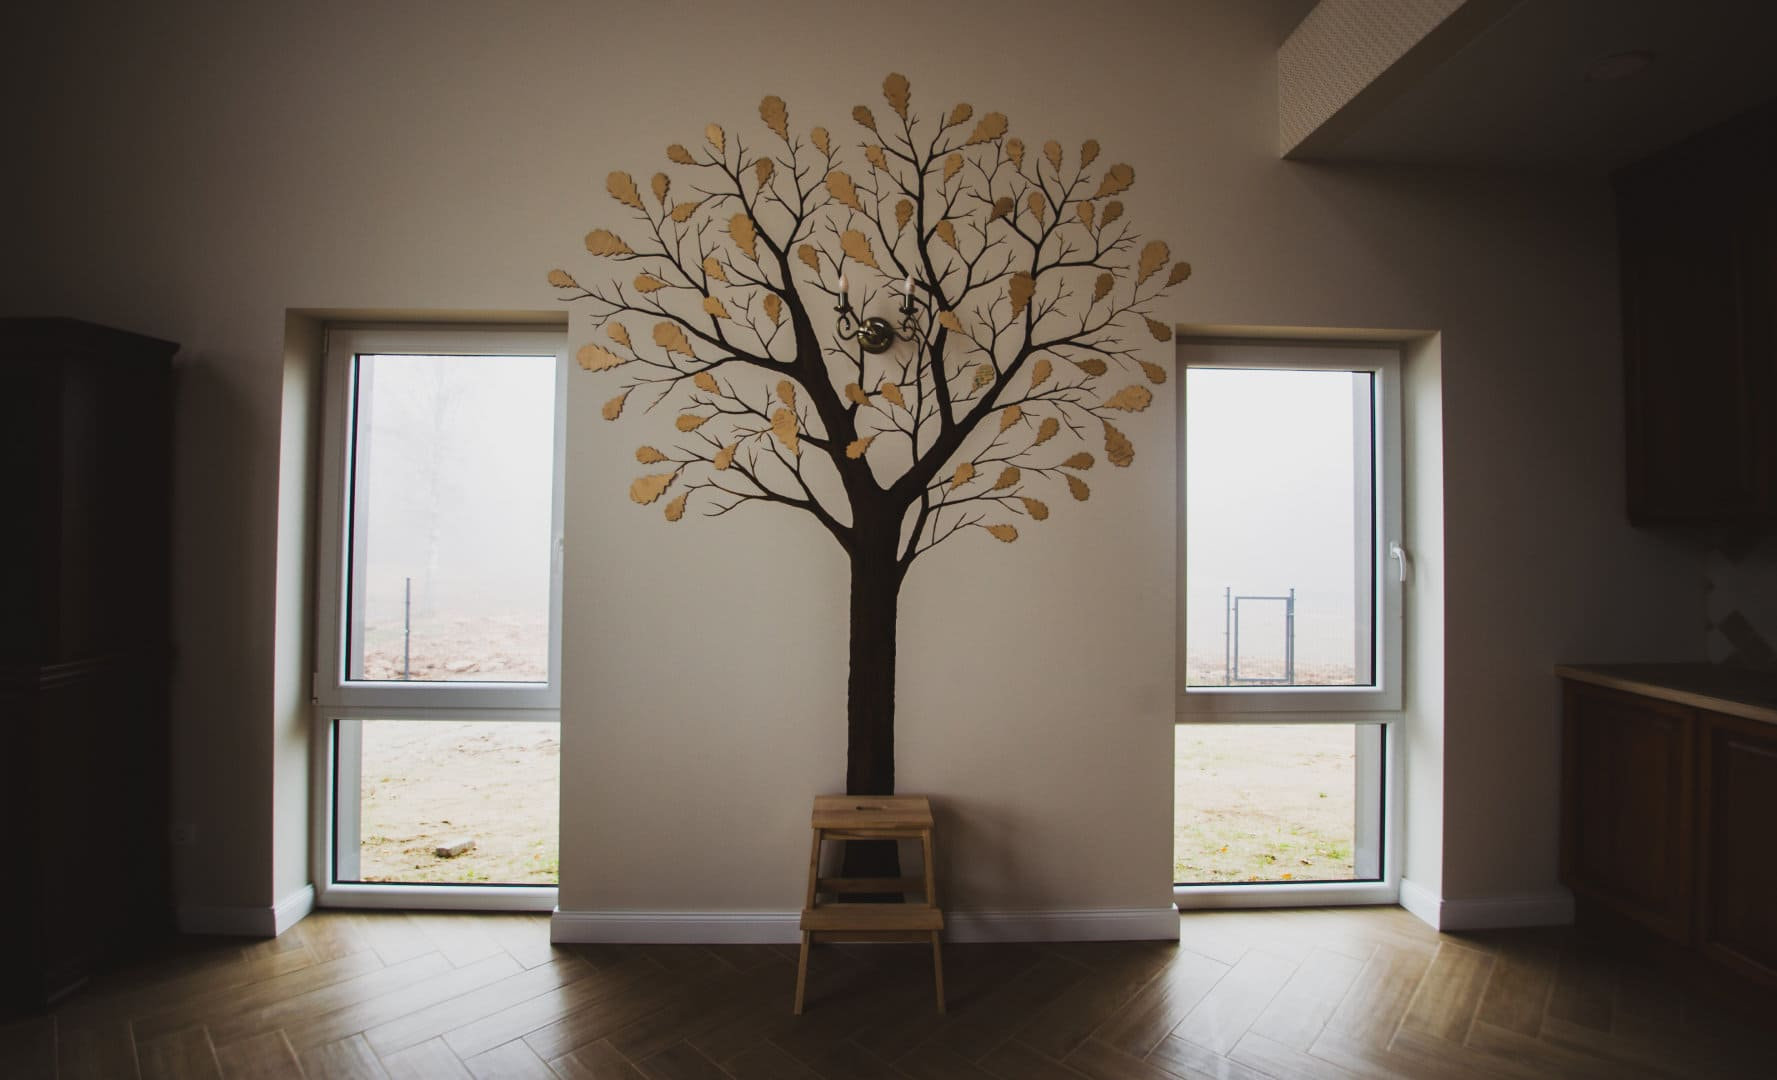 menine-kuryba-sienu-dekoravimas-ivairus-interjerai (41)